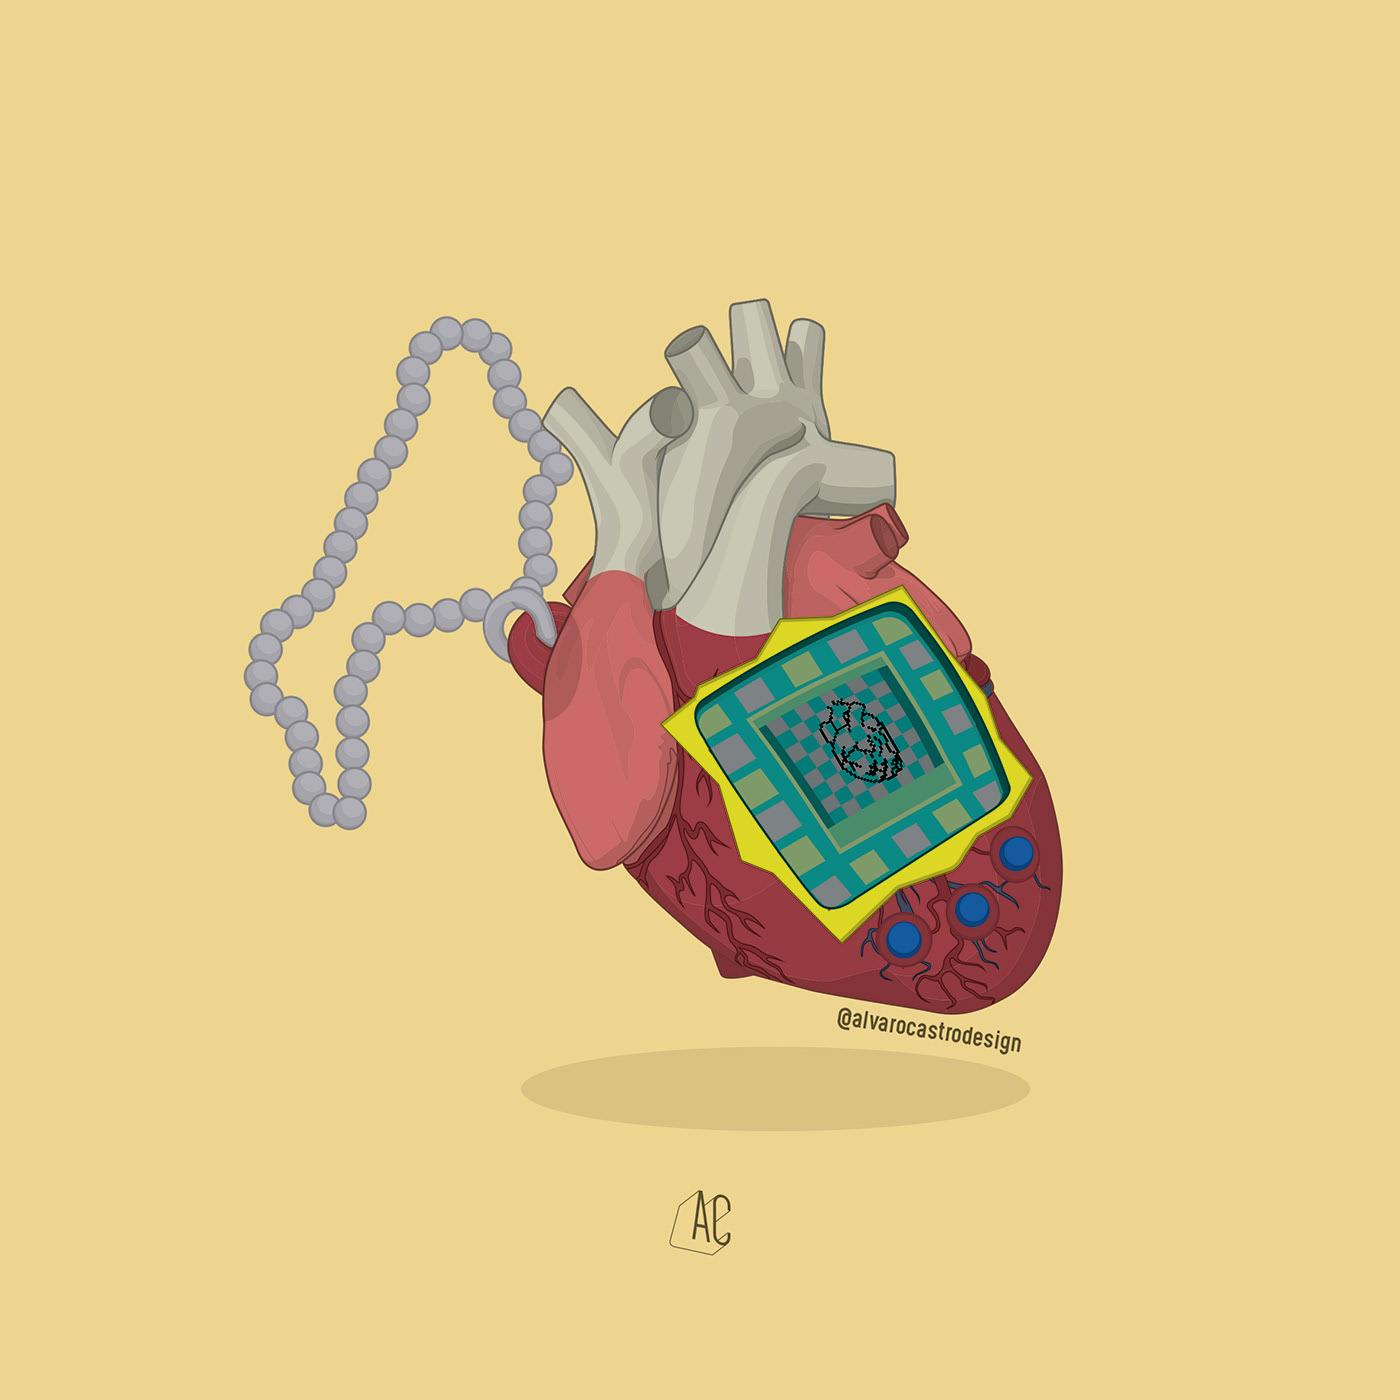 Alvaro Castro illustrates the emotions of the heart